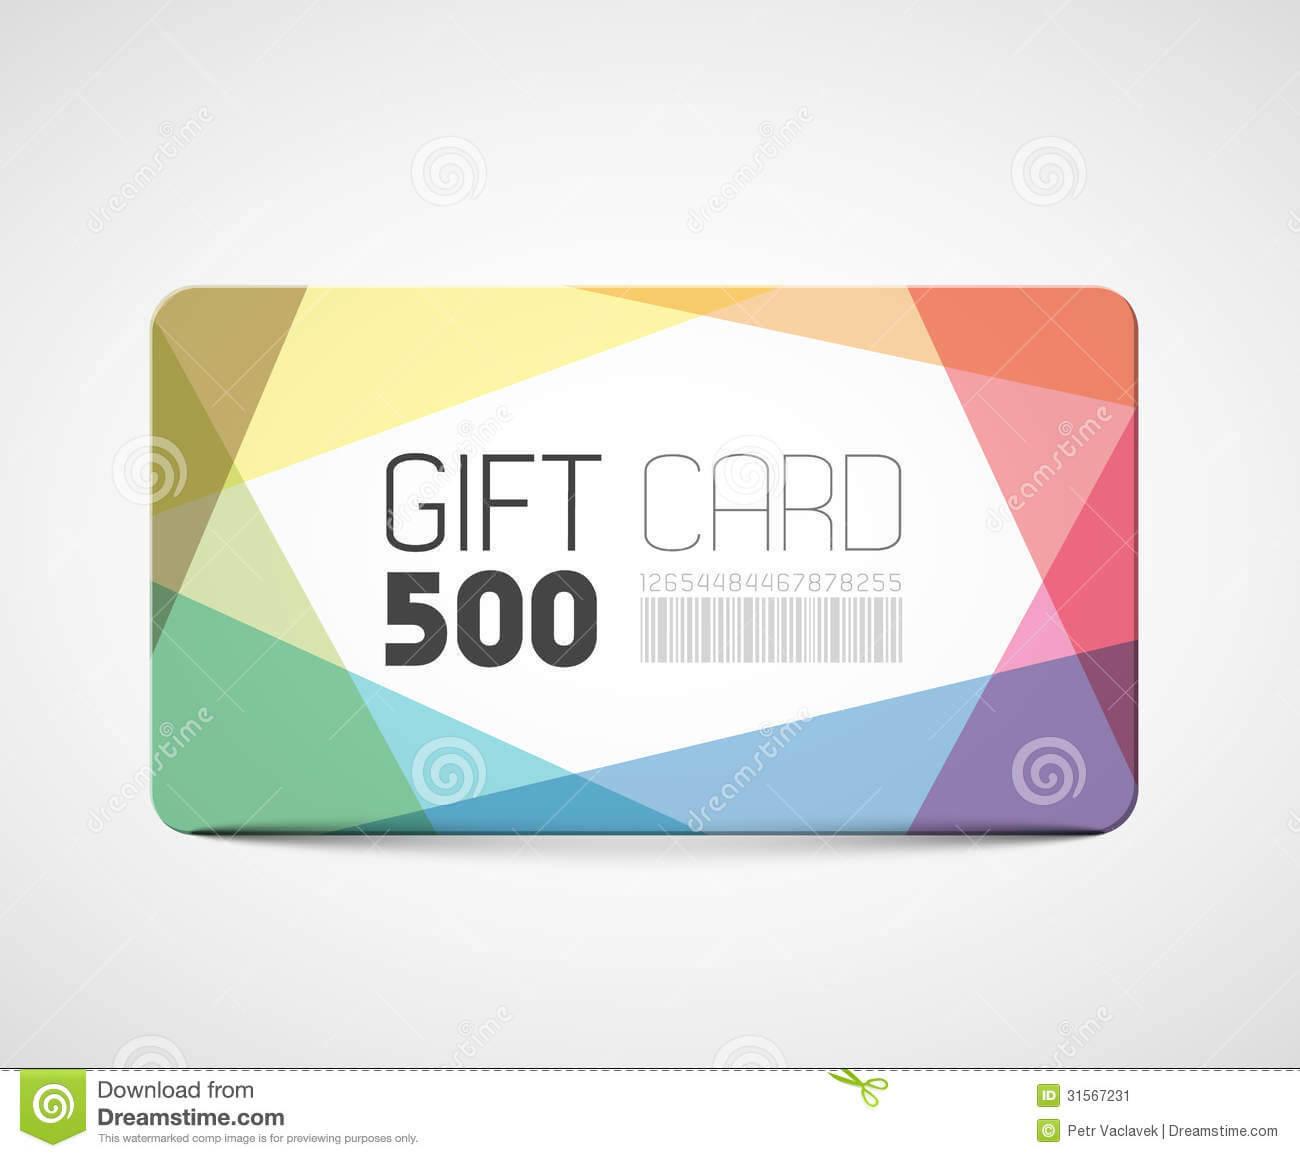 Modern Gift Card Template Stock Vector. Illustration Of Throughout Gift Card Template Illustrator